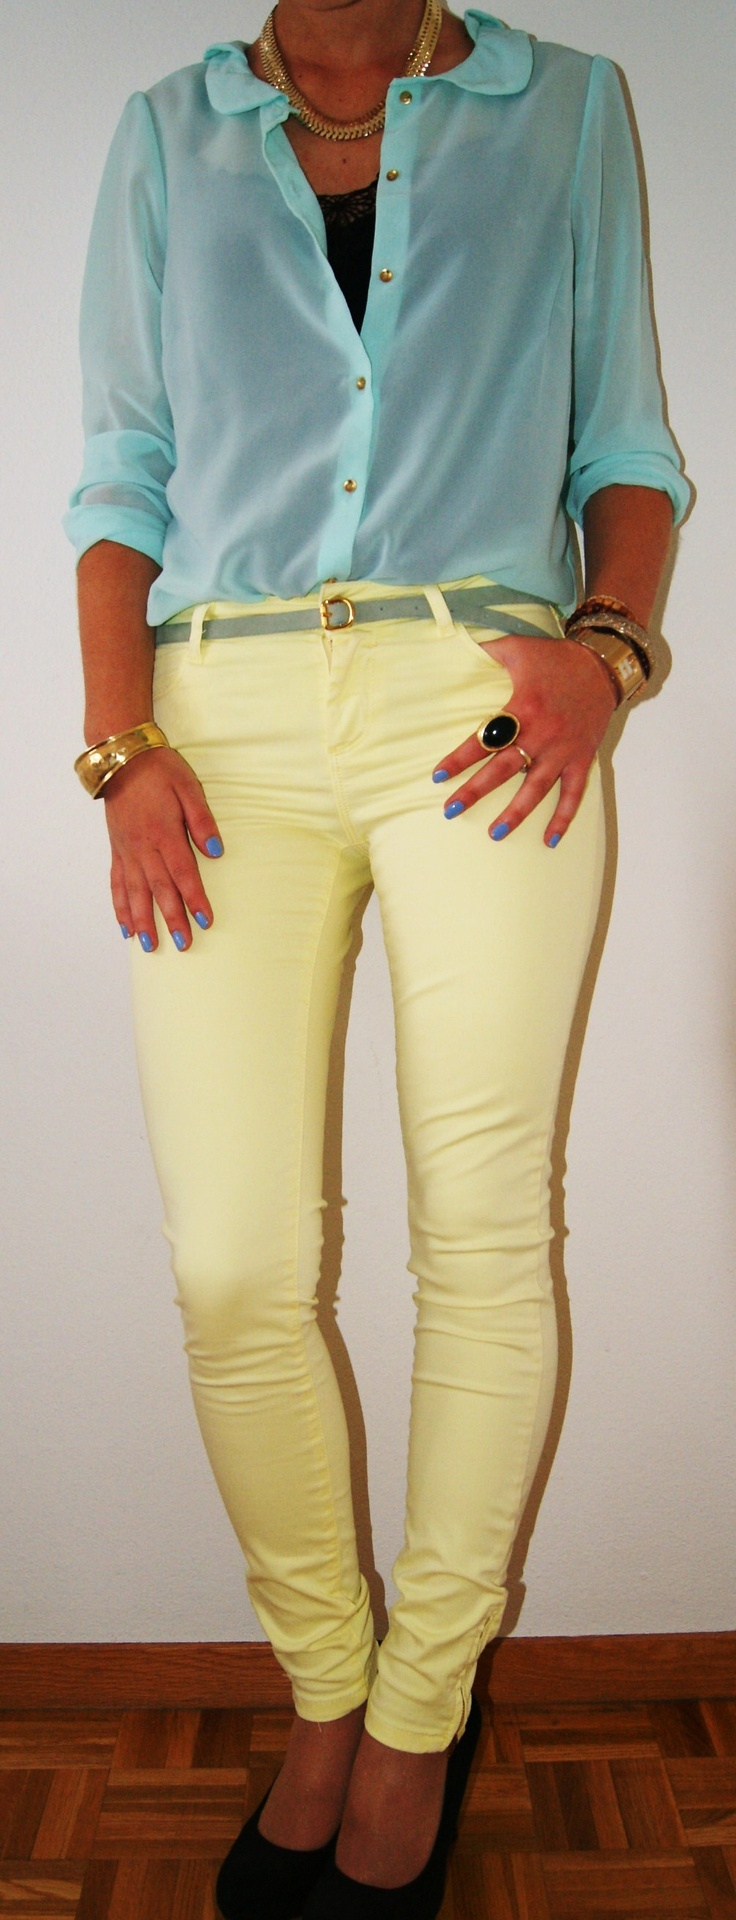 mint shirt and mustard/yellow pants